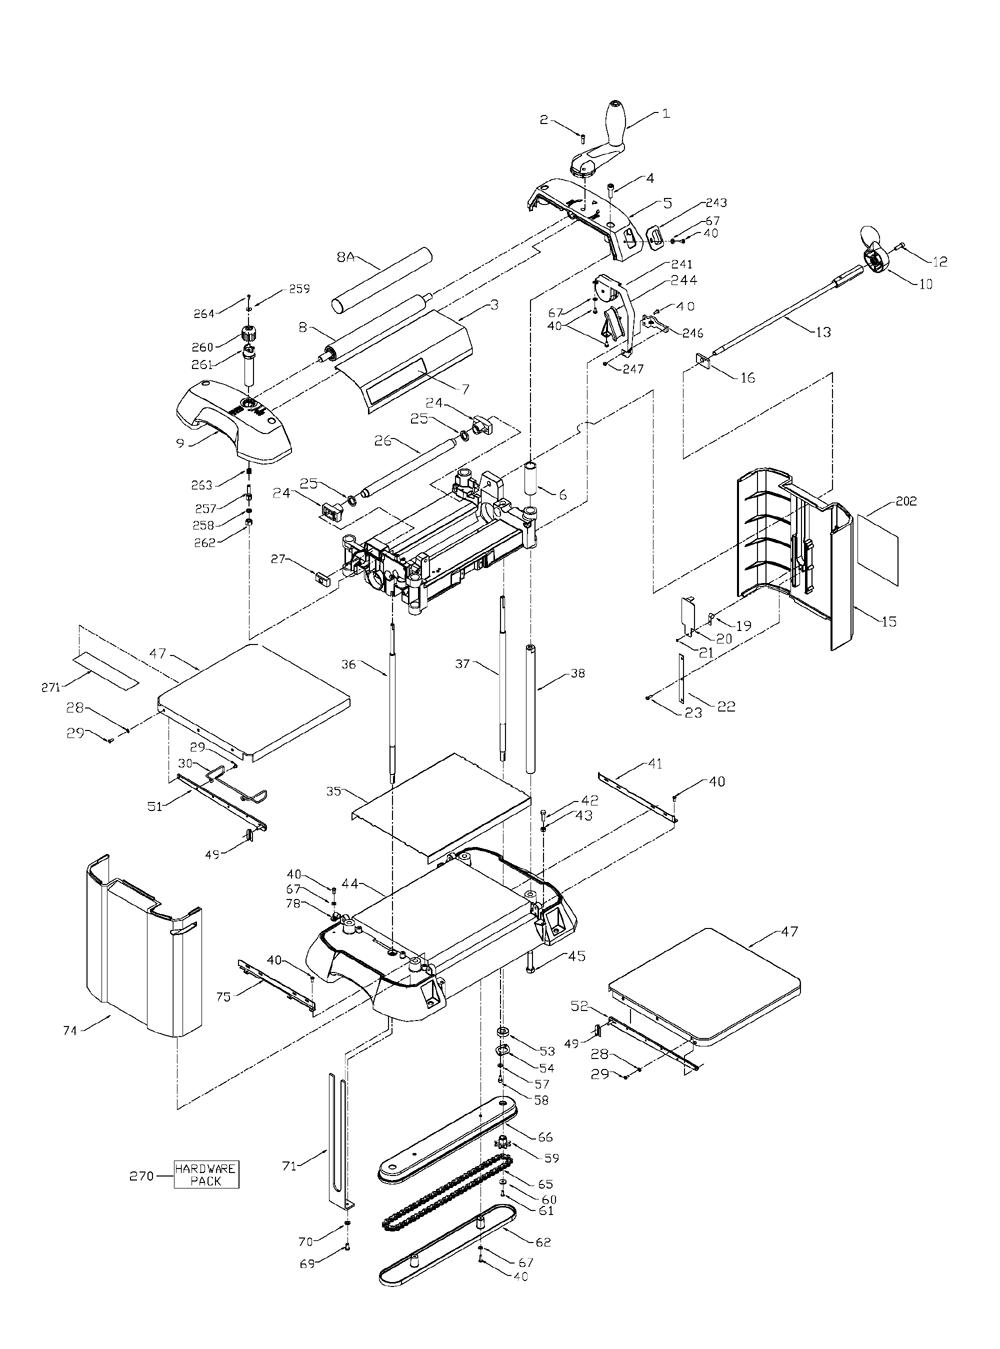 Buy Delta 22 580 Type 1 Replacement Tool Parts Wilton 846 List And Diagram Ereplacementpartscom Schematic